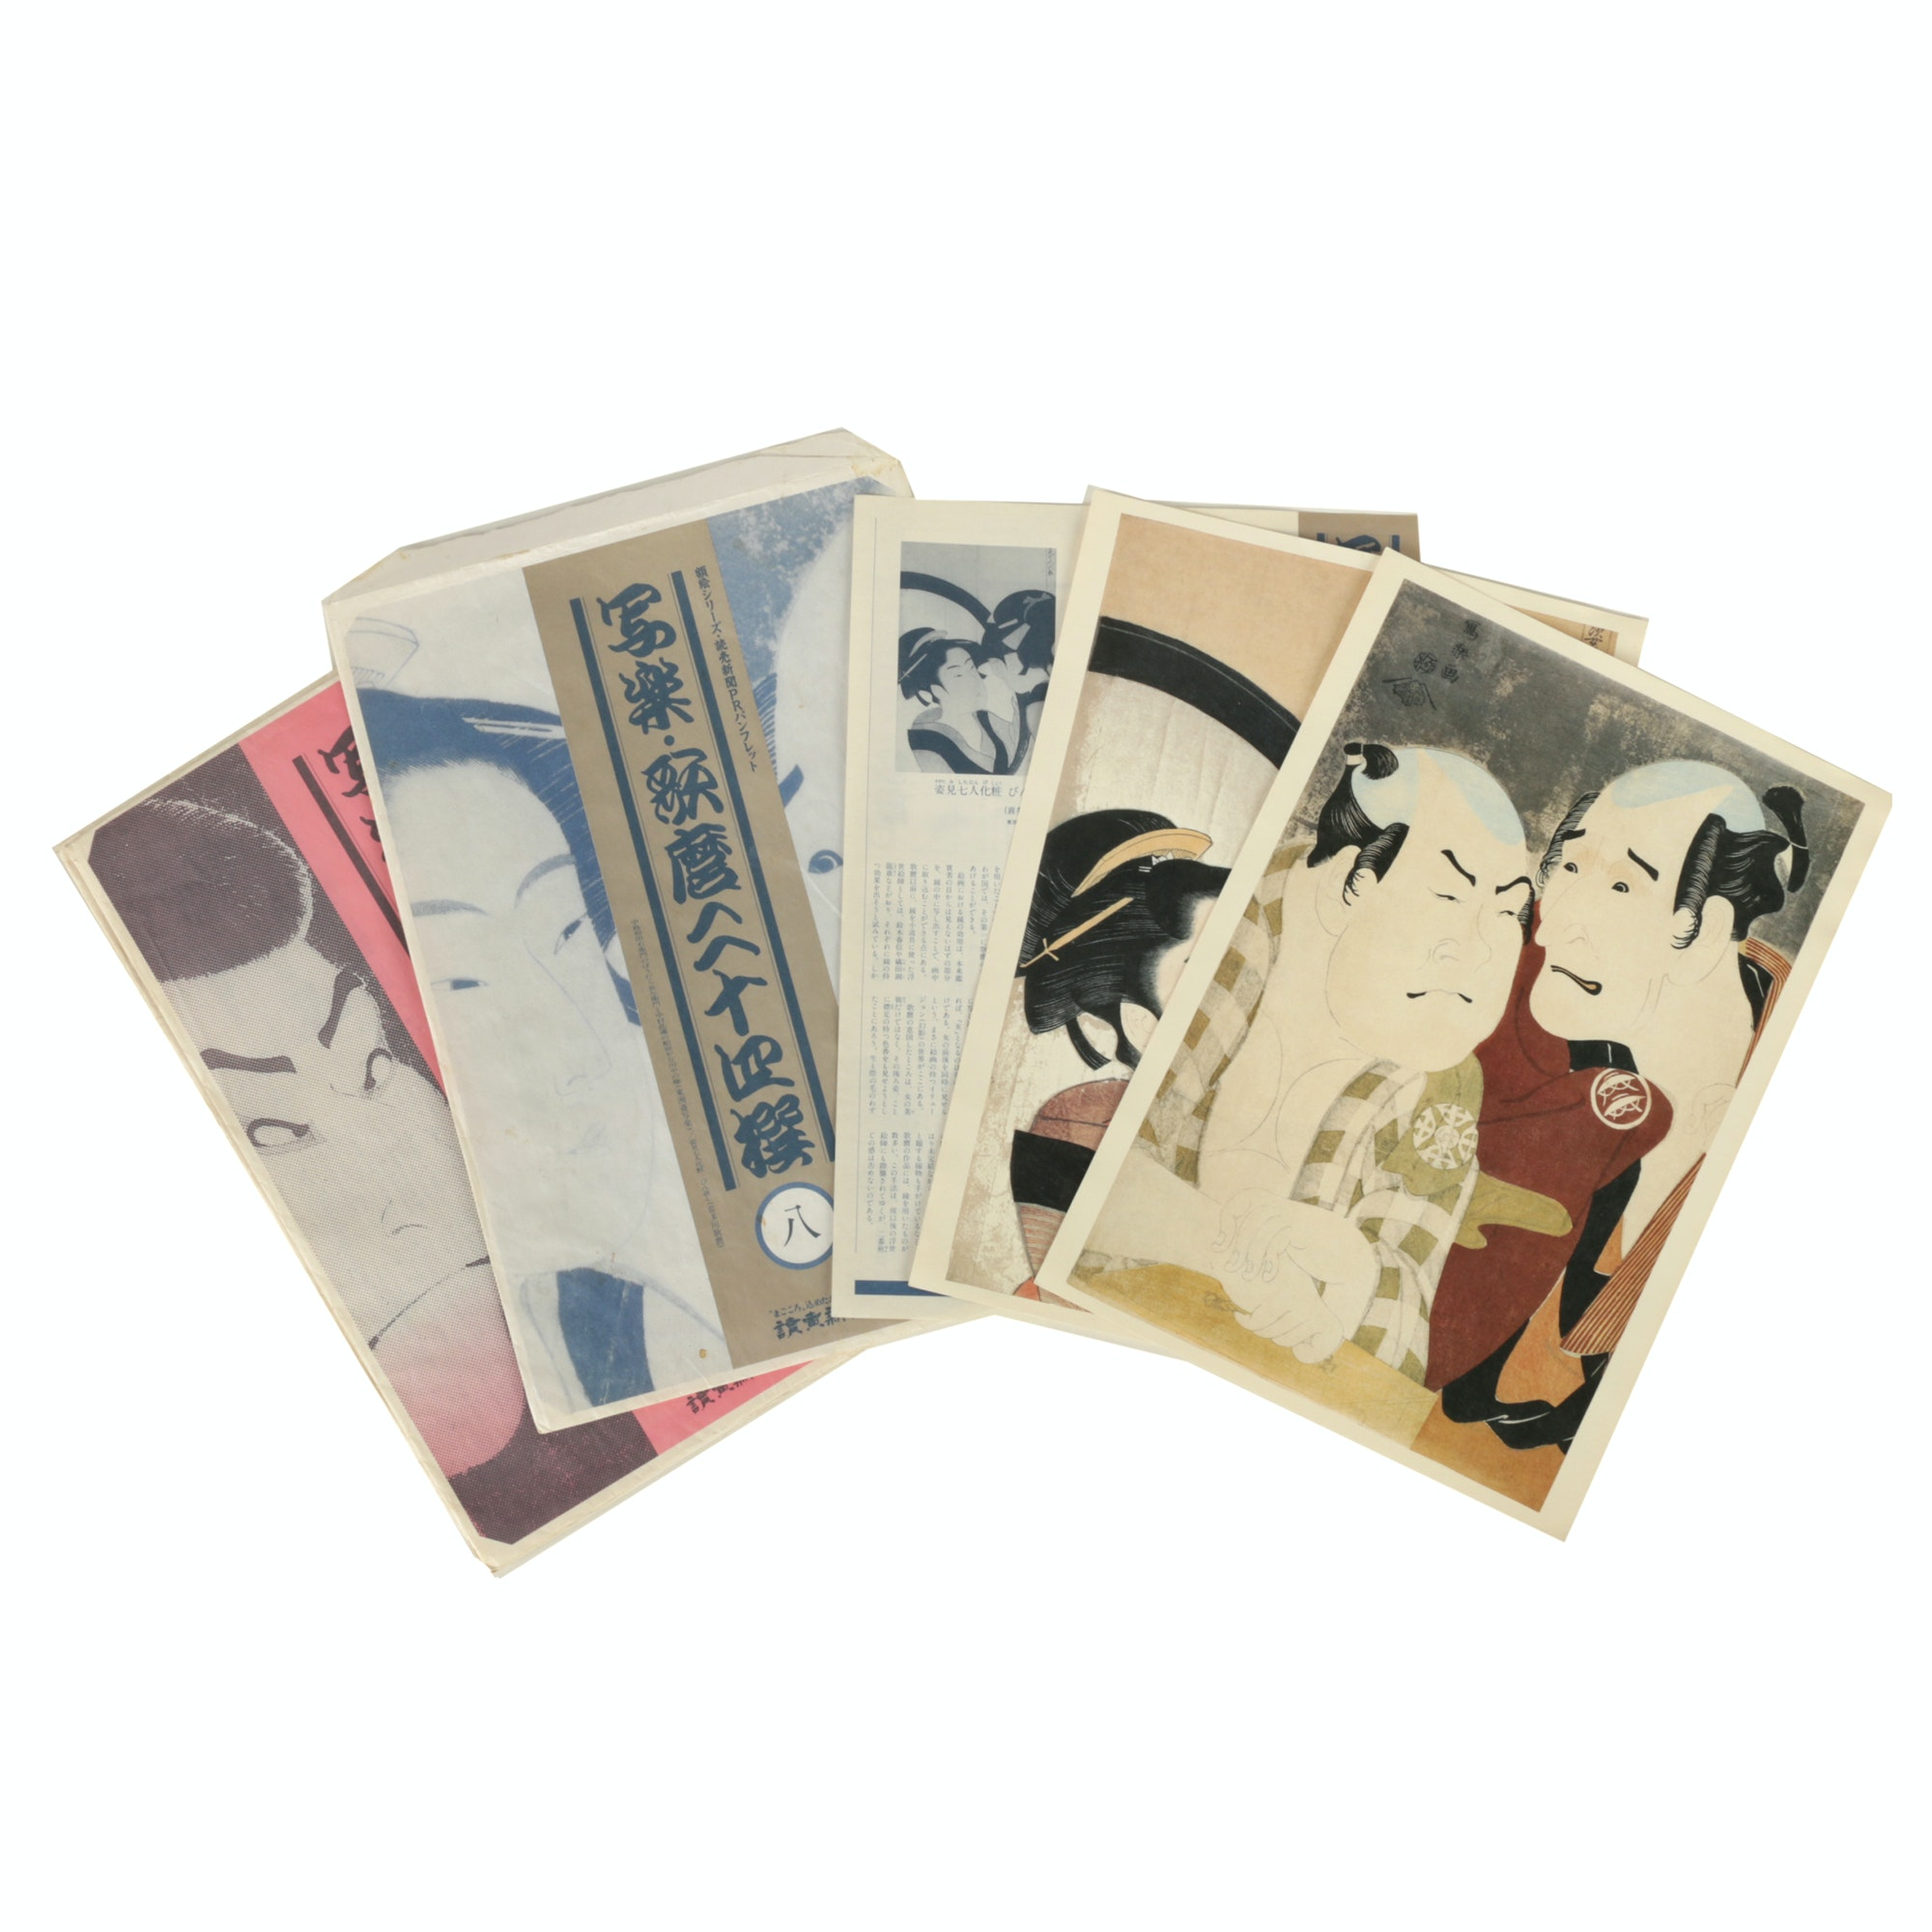 Offset Lithograph Prints After Japanese Woodblocks Featuring Kitagawa Utamaro